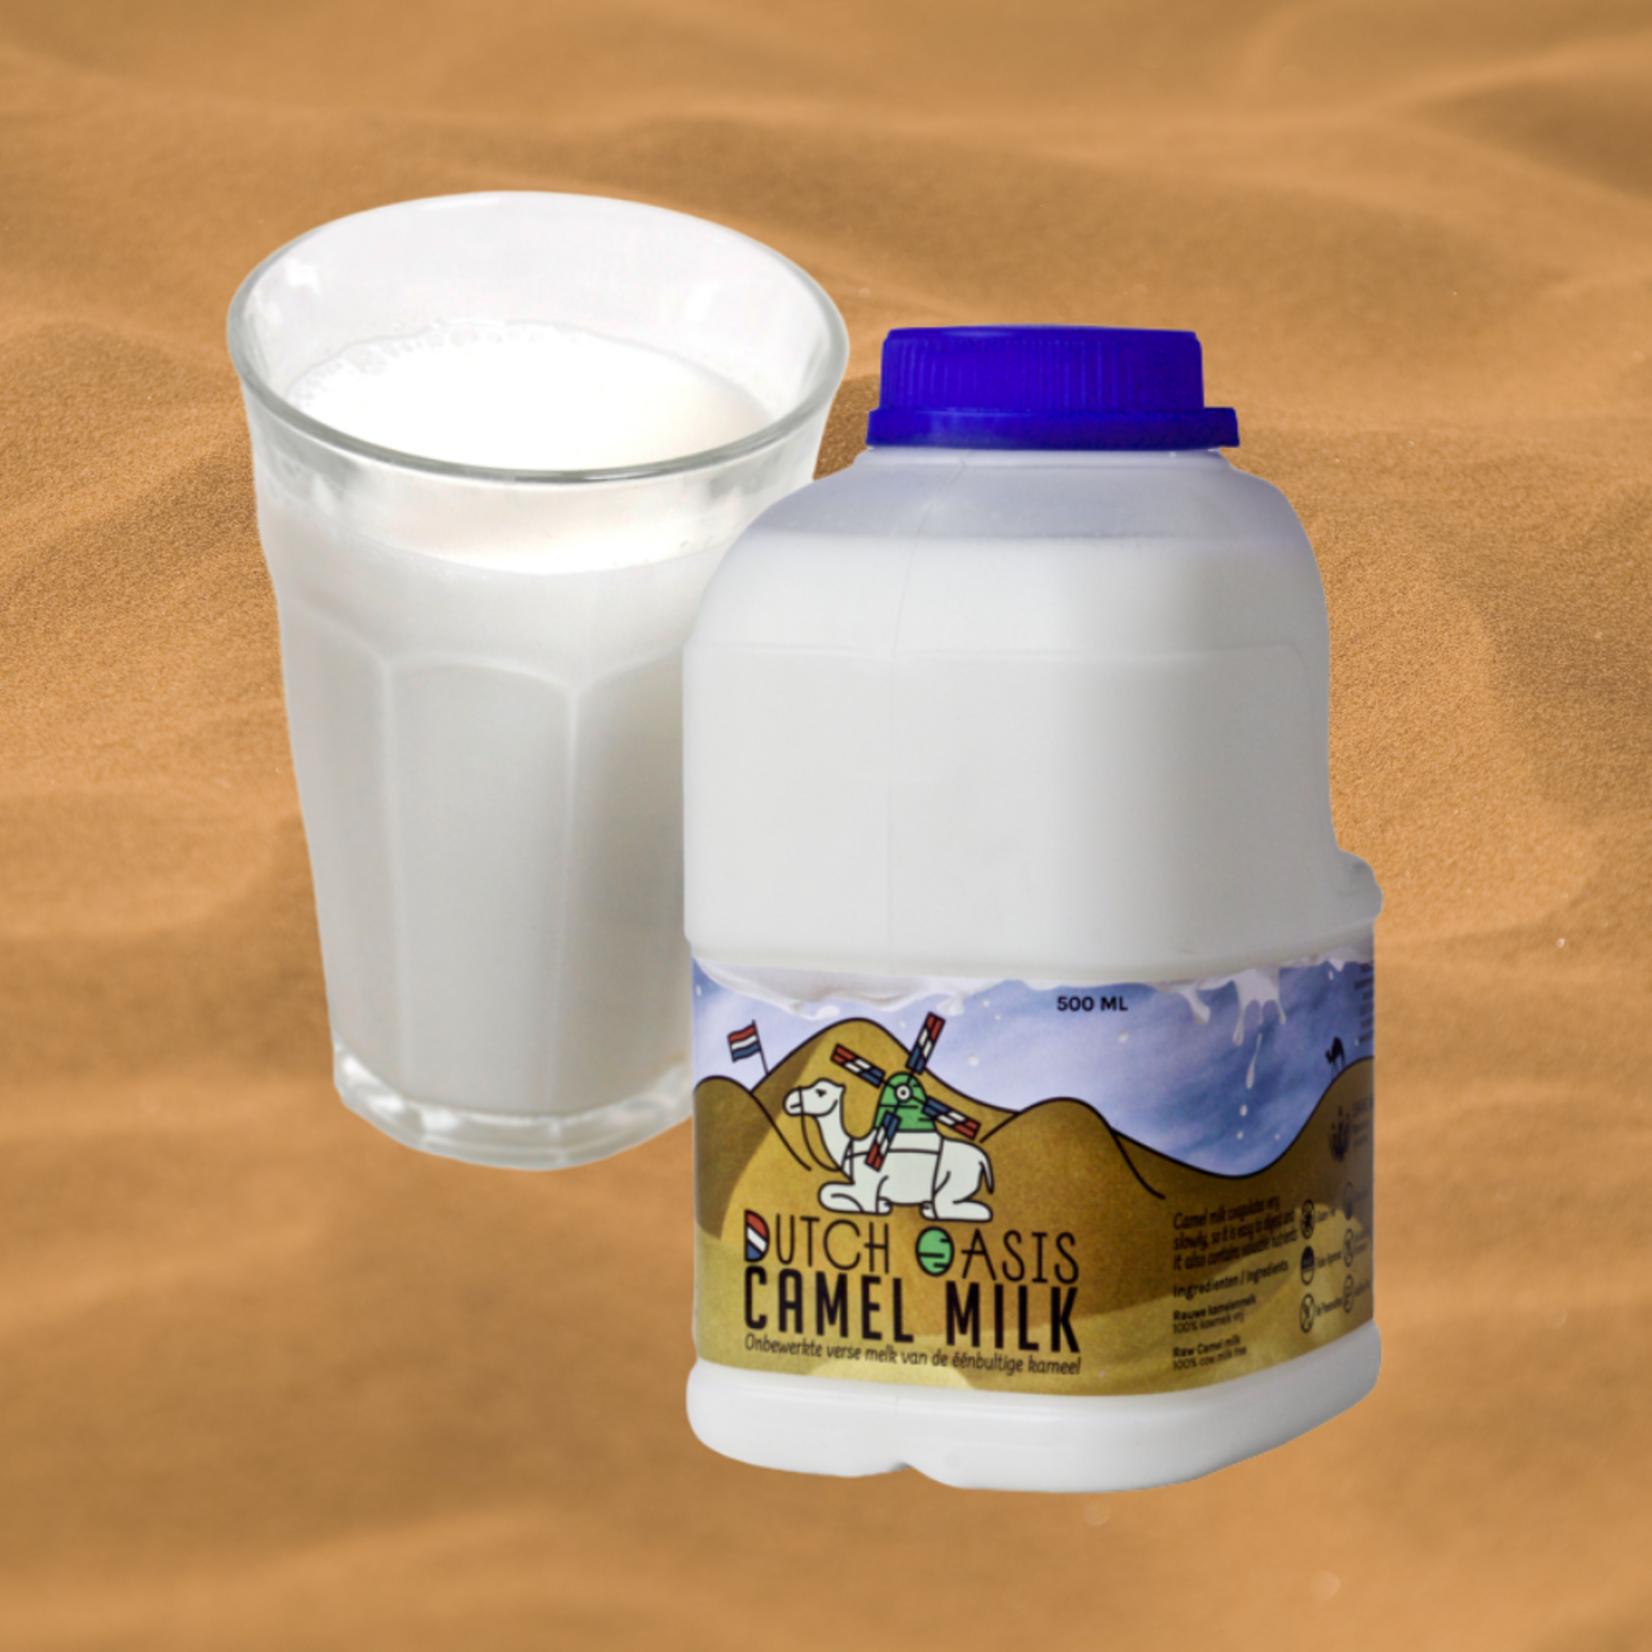 Dutch Oasis NIEUW! Subscription 1x per 2 weeks: 14 bottles fresh, raw camel milk